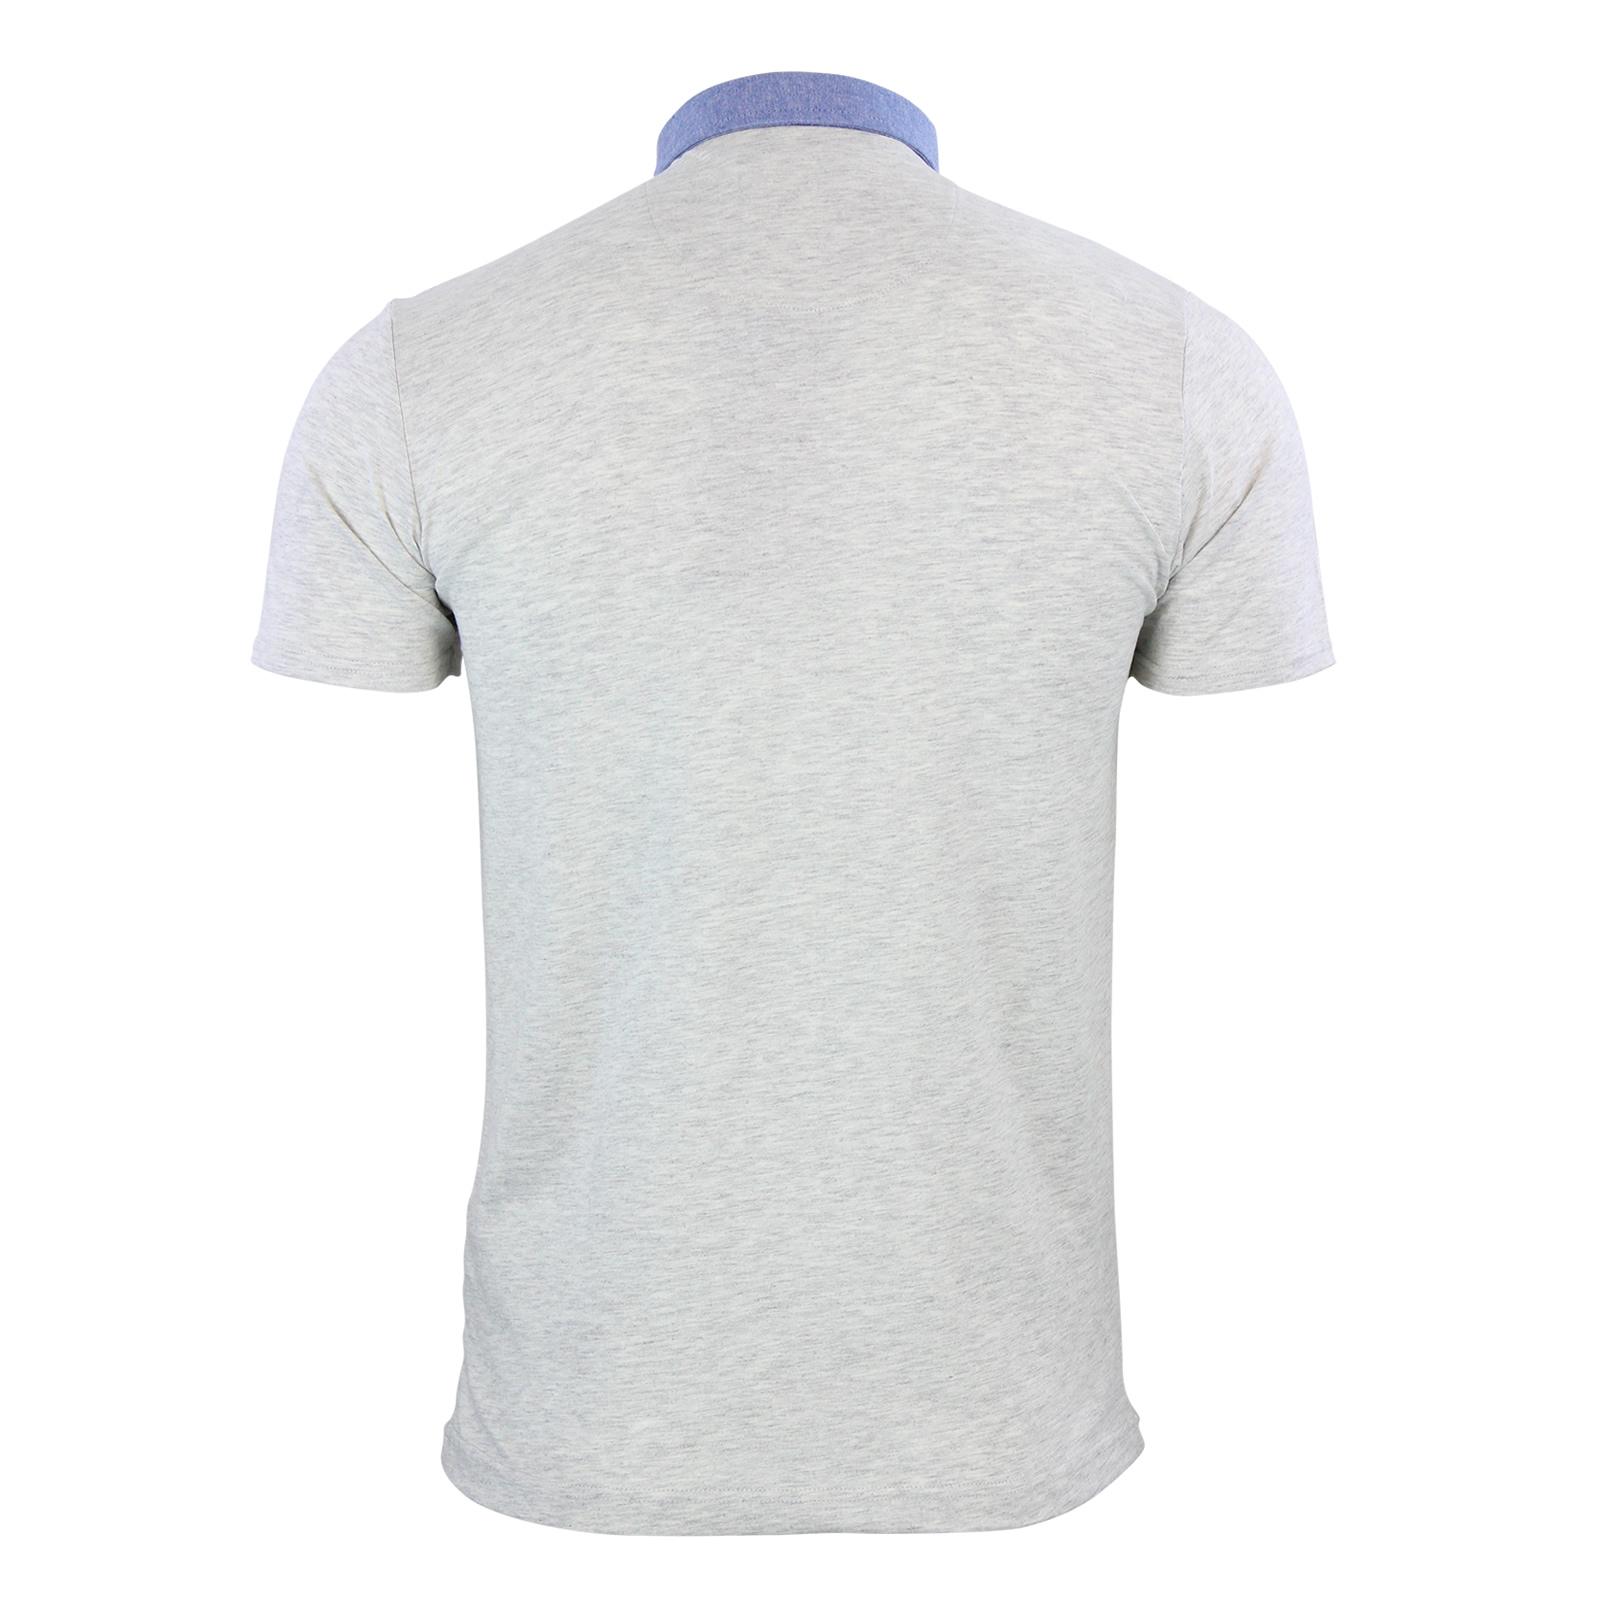 Mens-Polo-T-Shirt-Brave-Soul-Chimera-Chambray-Collared-Cotton-Casual-Top thumbnail 9